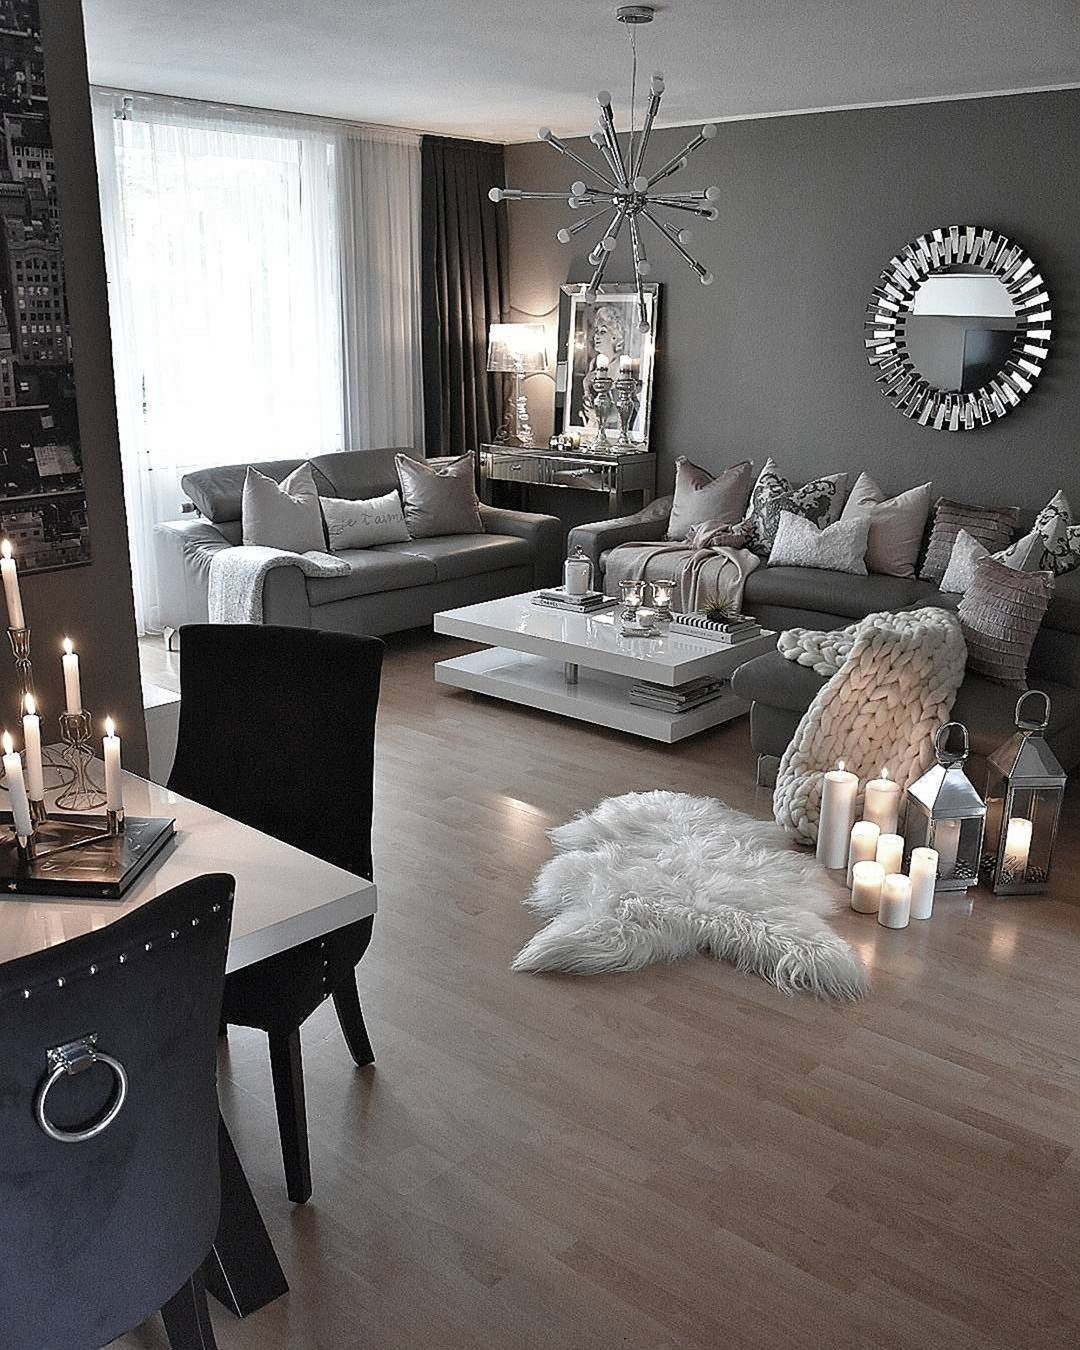 40 Best Black And White Interior Design Ideas Freshouz Com In